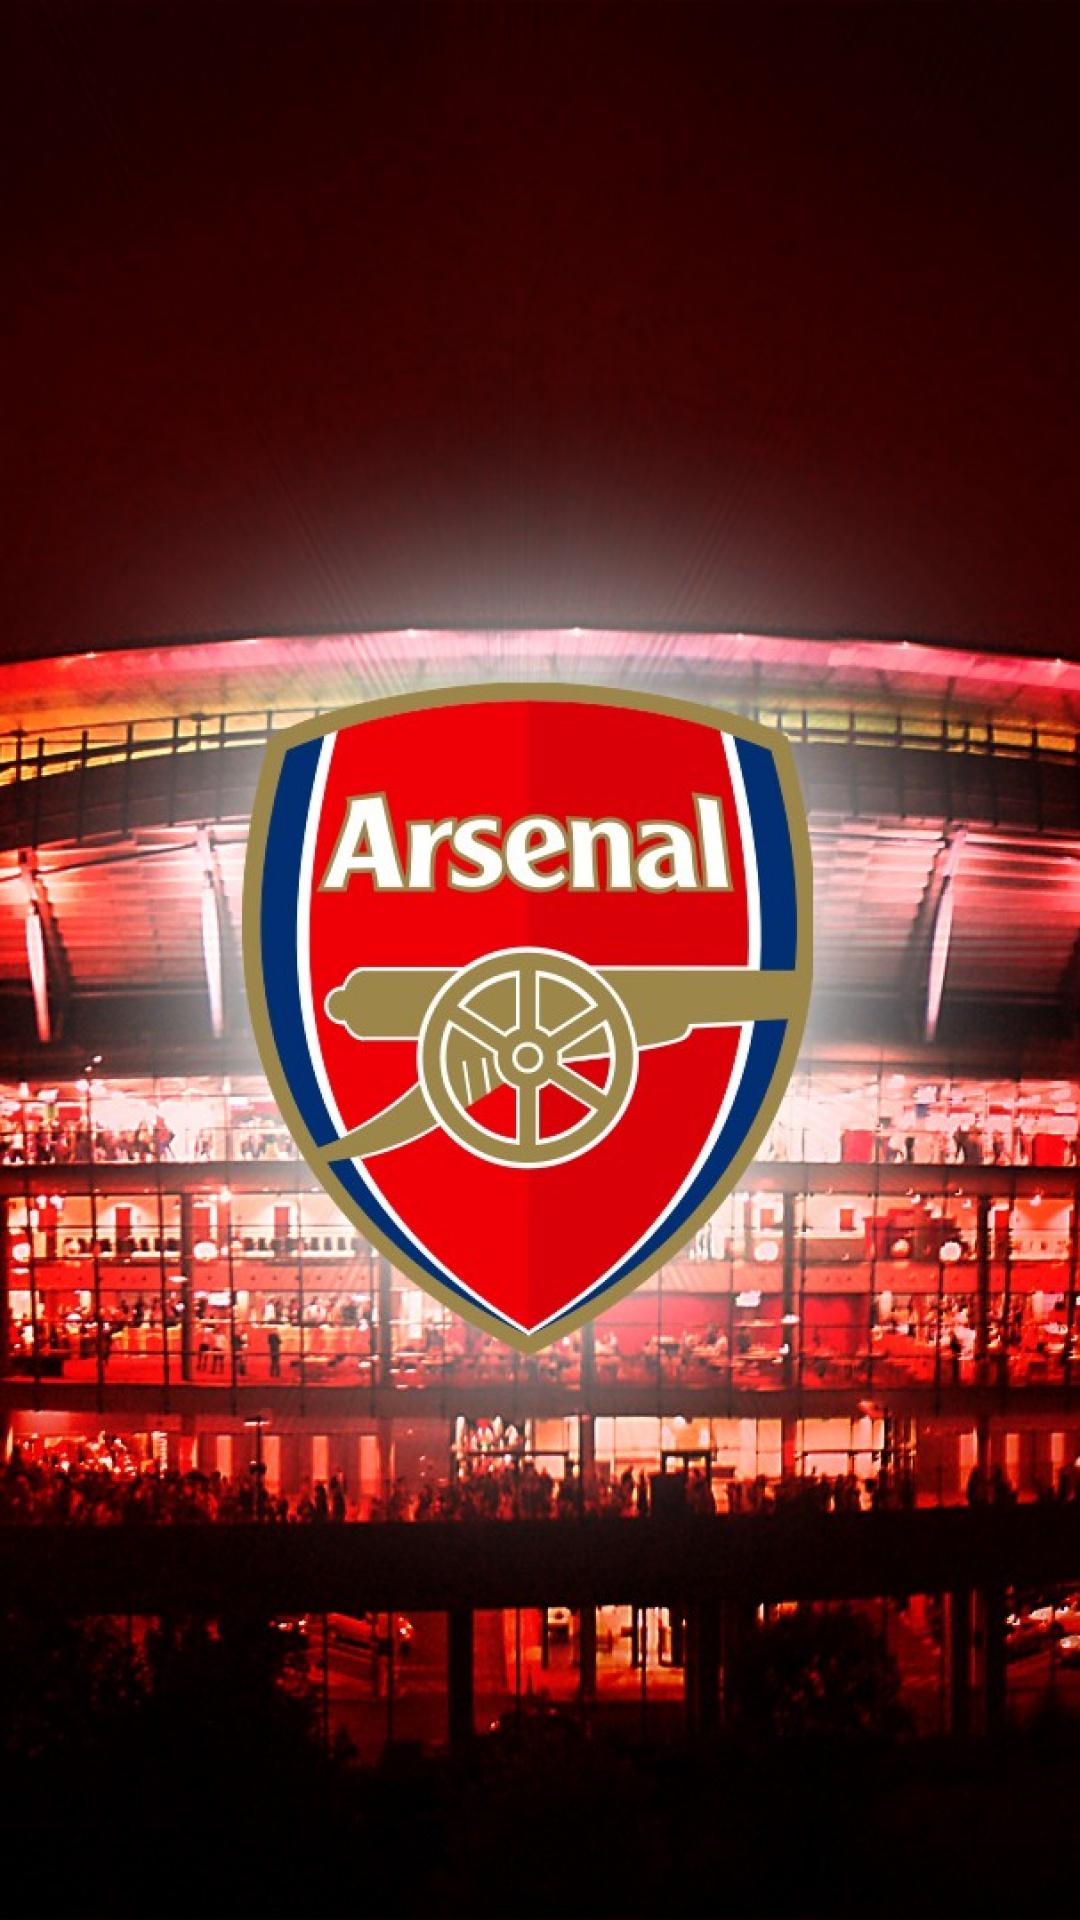 Iphone 5 Arsenal Wallpaper Arsenal Logo Hd Wallpaper For Mobile Pixelstalk Net